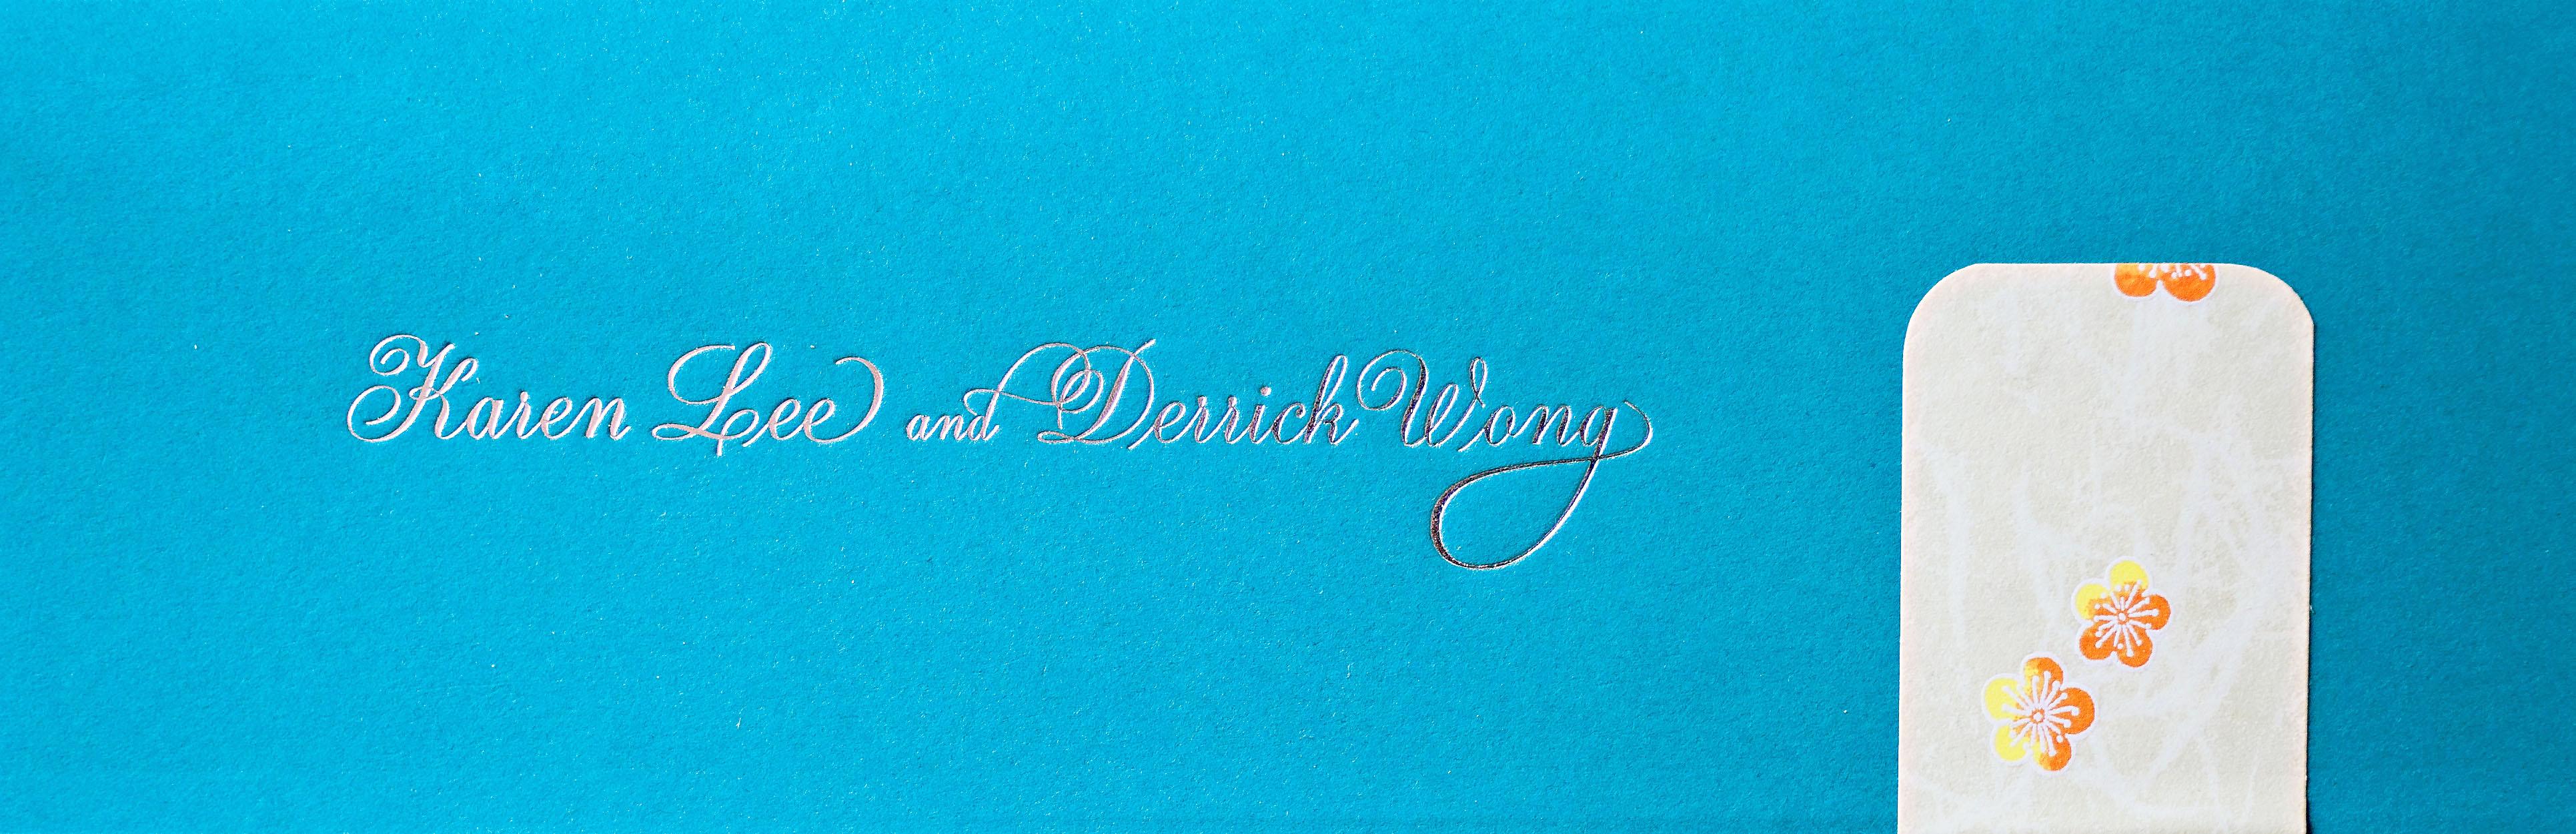 Karen and Derrick's Wedding – Cornerstone Chinese Alliance Church